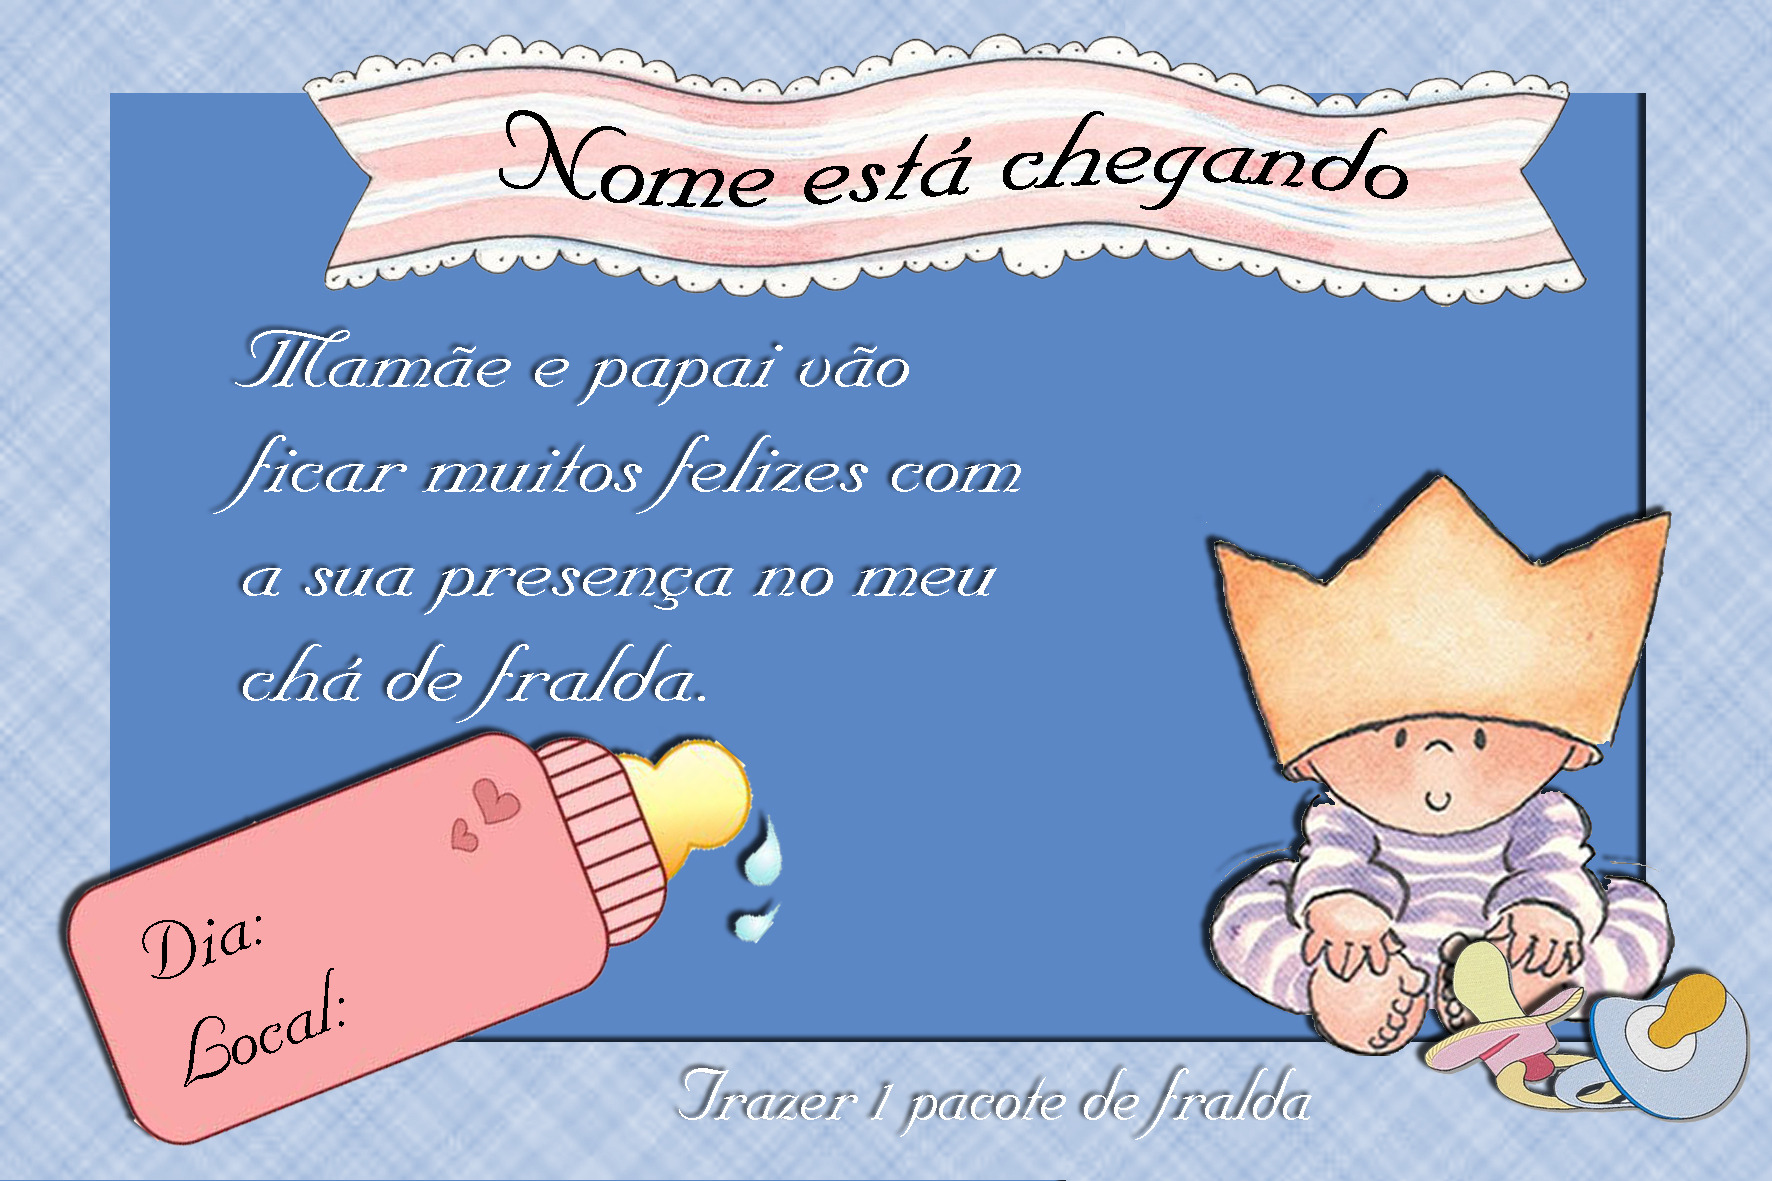 Convite Chá De Bebê Ou Fralda Convite Chá De Bebê Ou Fralda